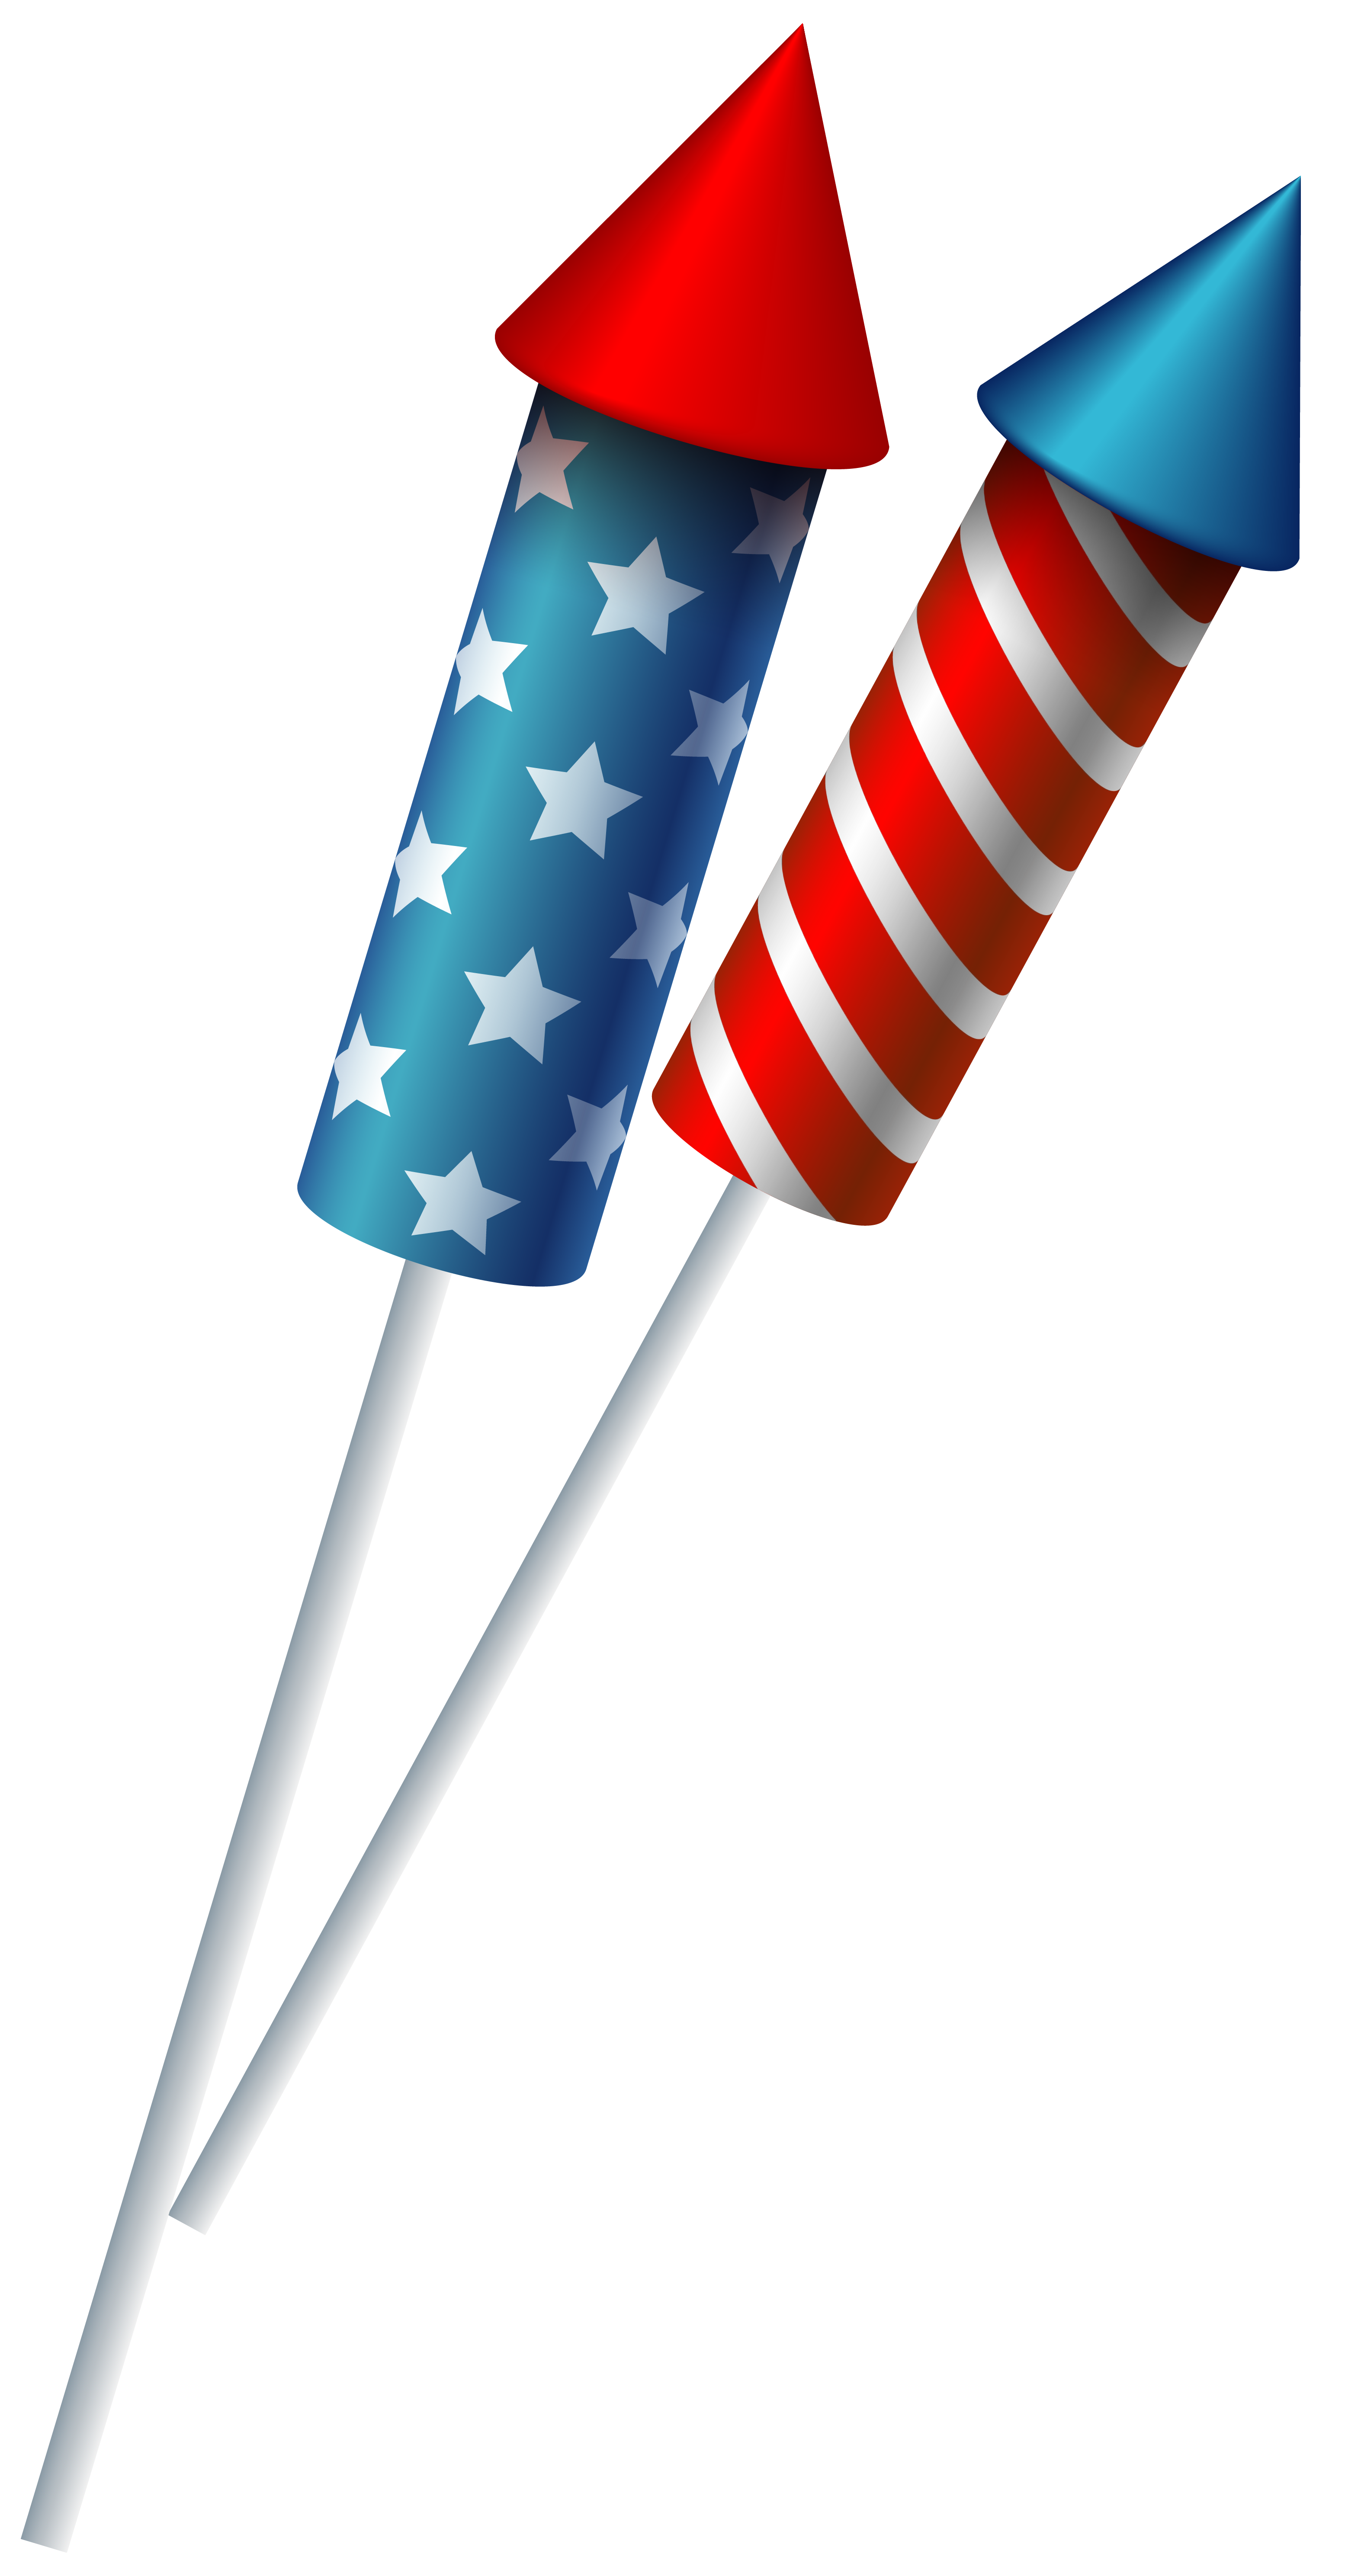 Firecracker clipart sparkler. Fireworks independence day clip